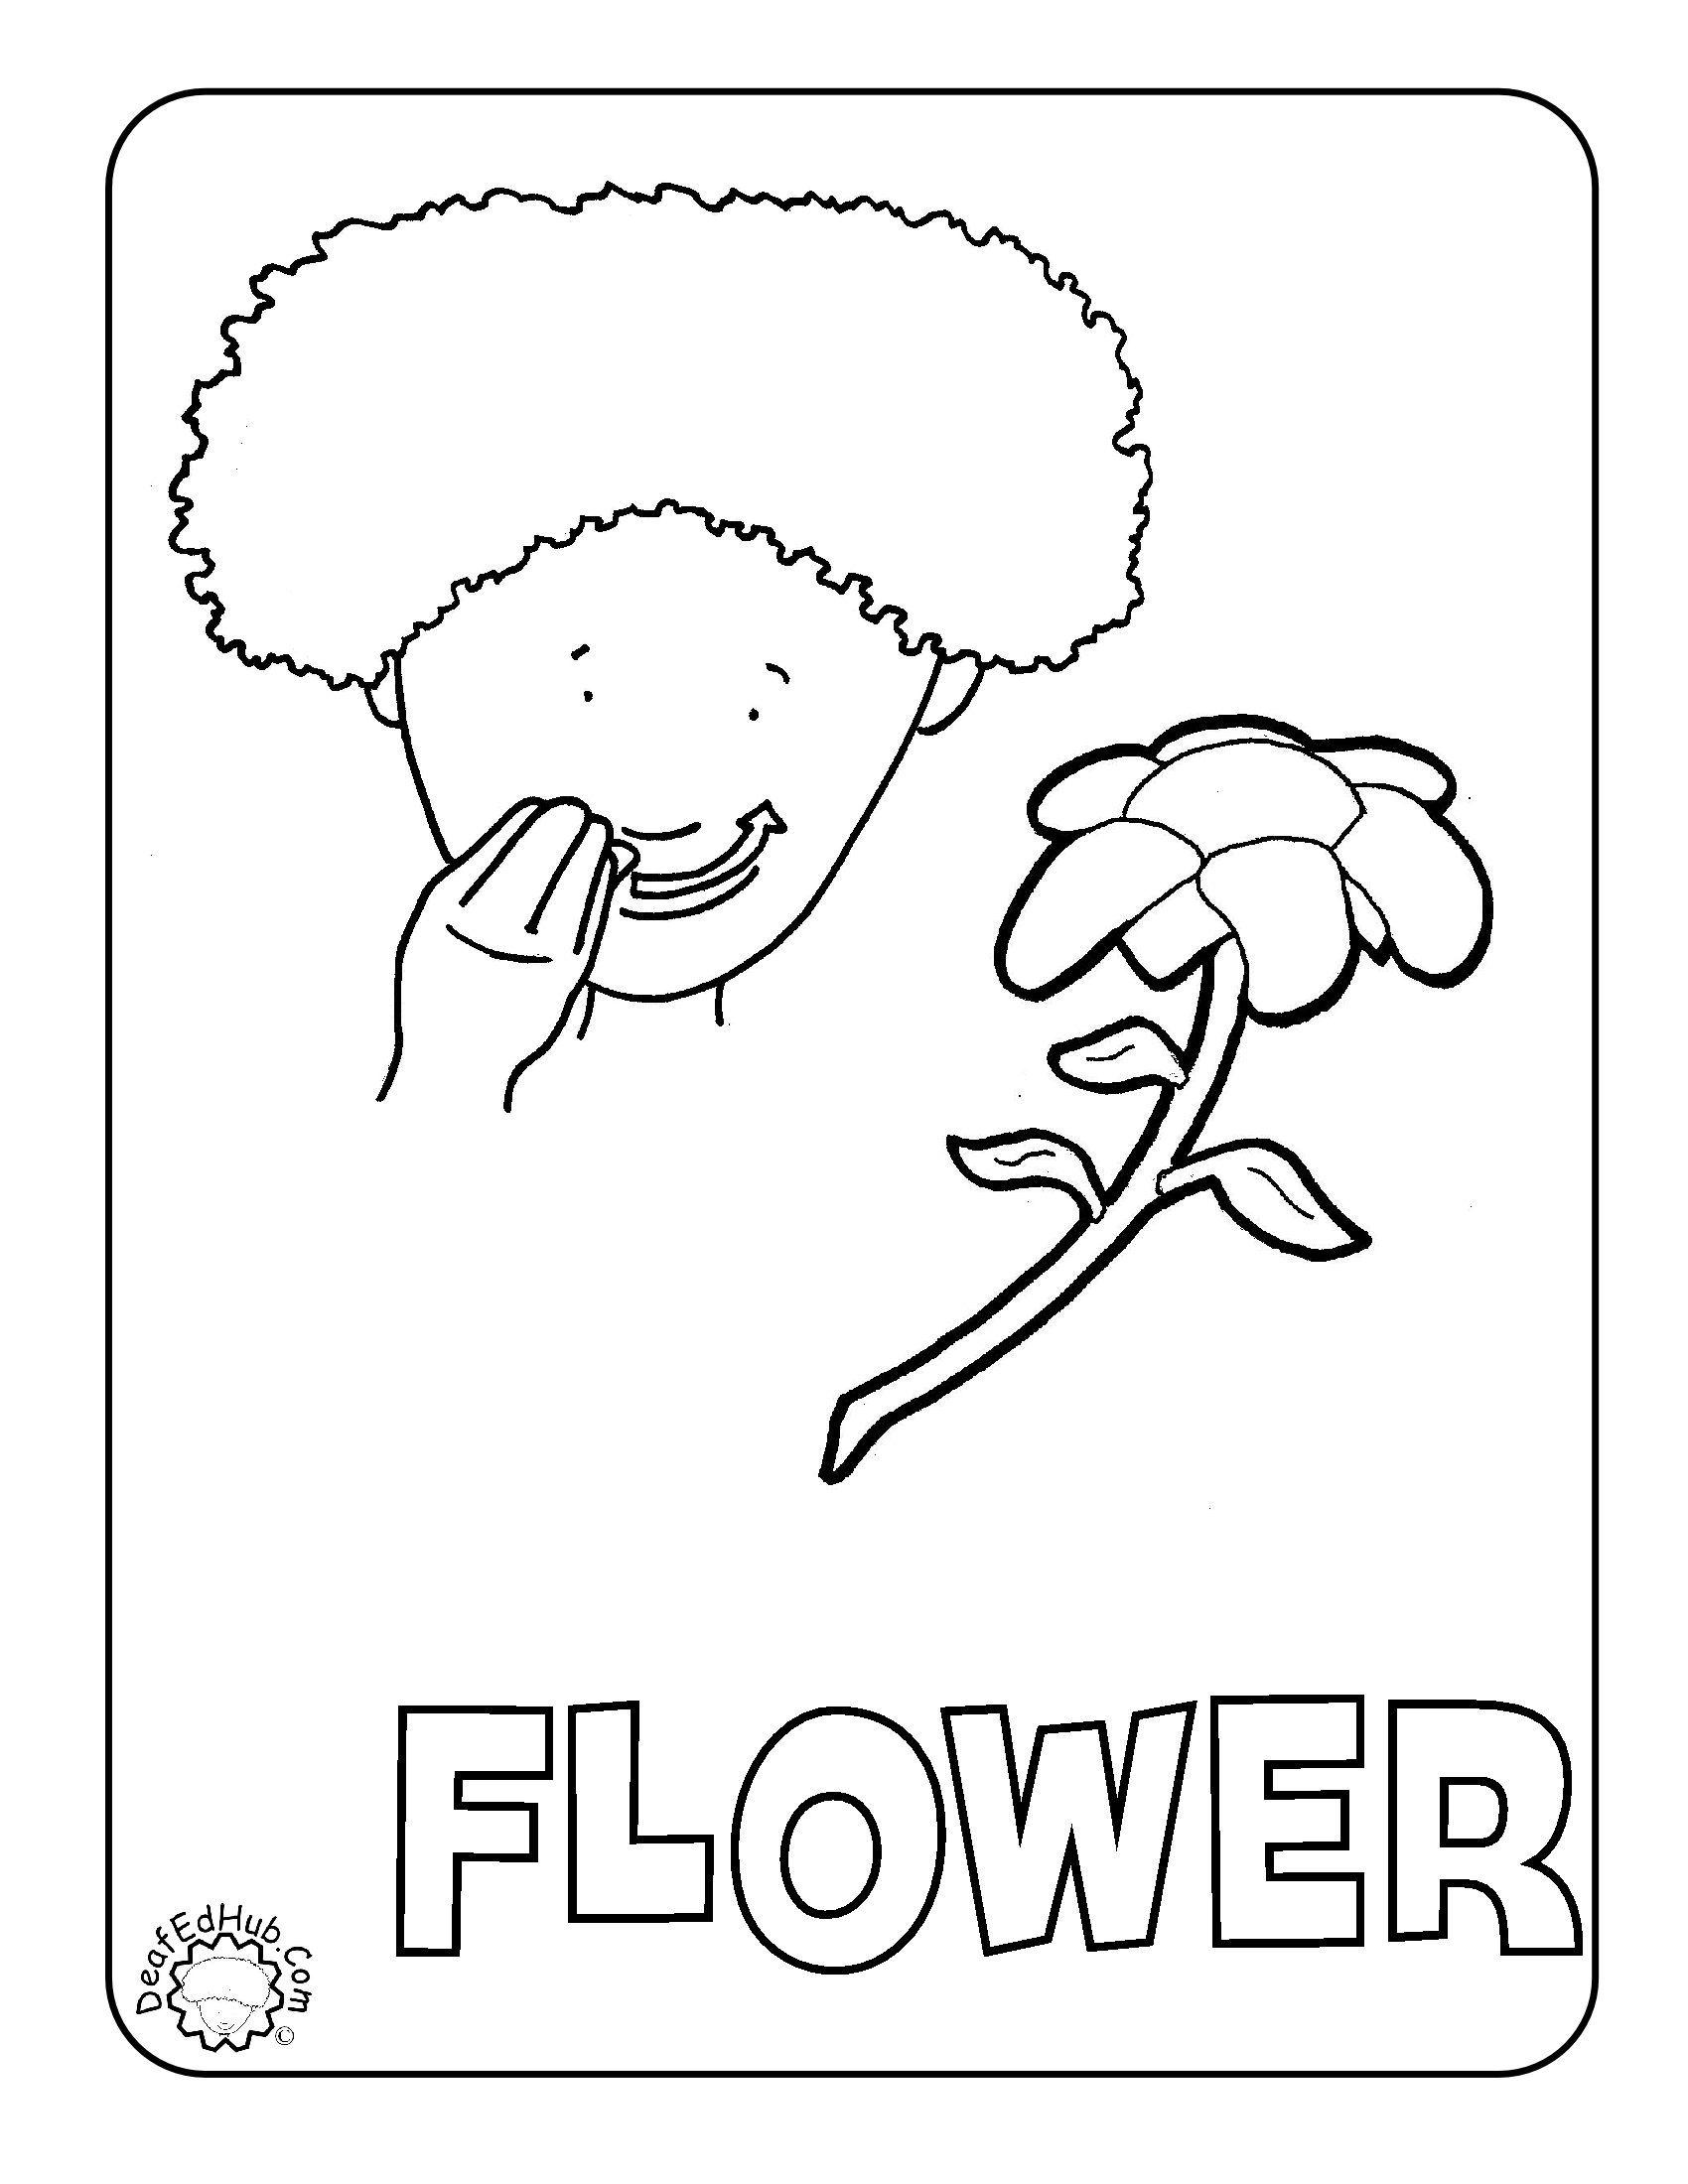 sign language coloring sheets kindergarten worksheets asl coloring pages alphabet x sheets language sign coloring